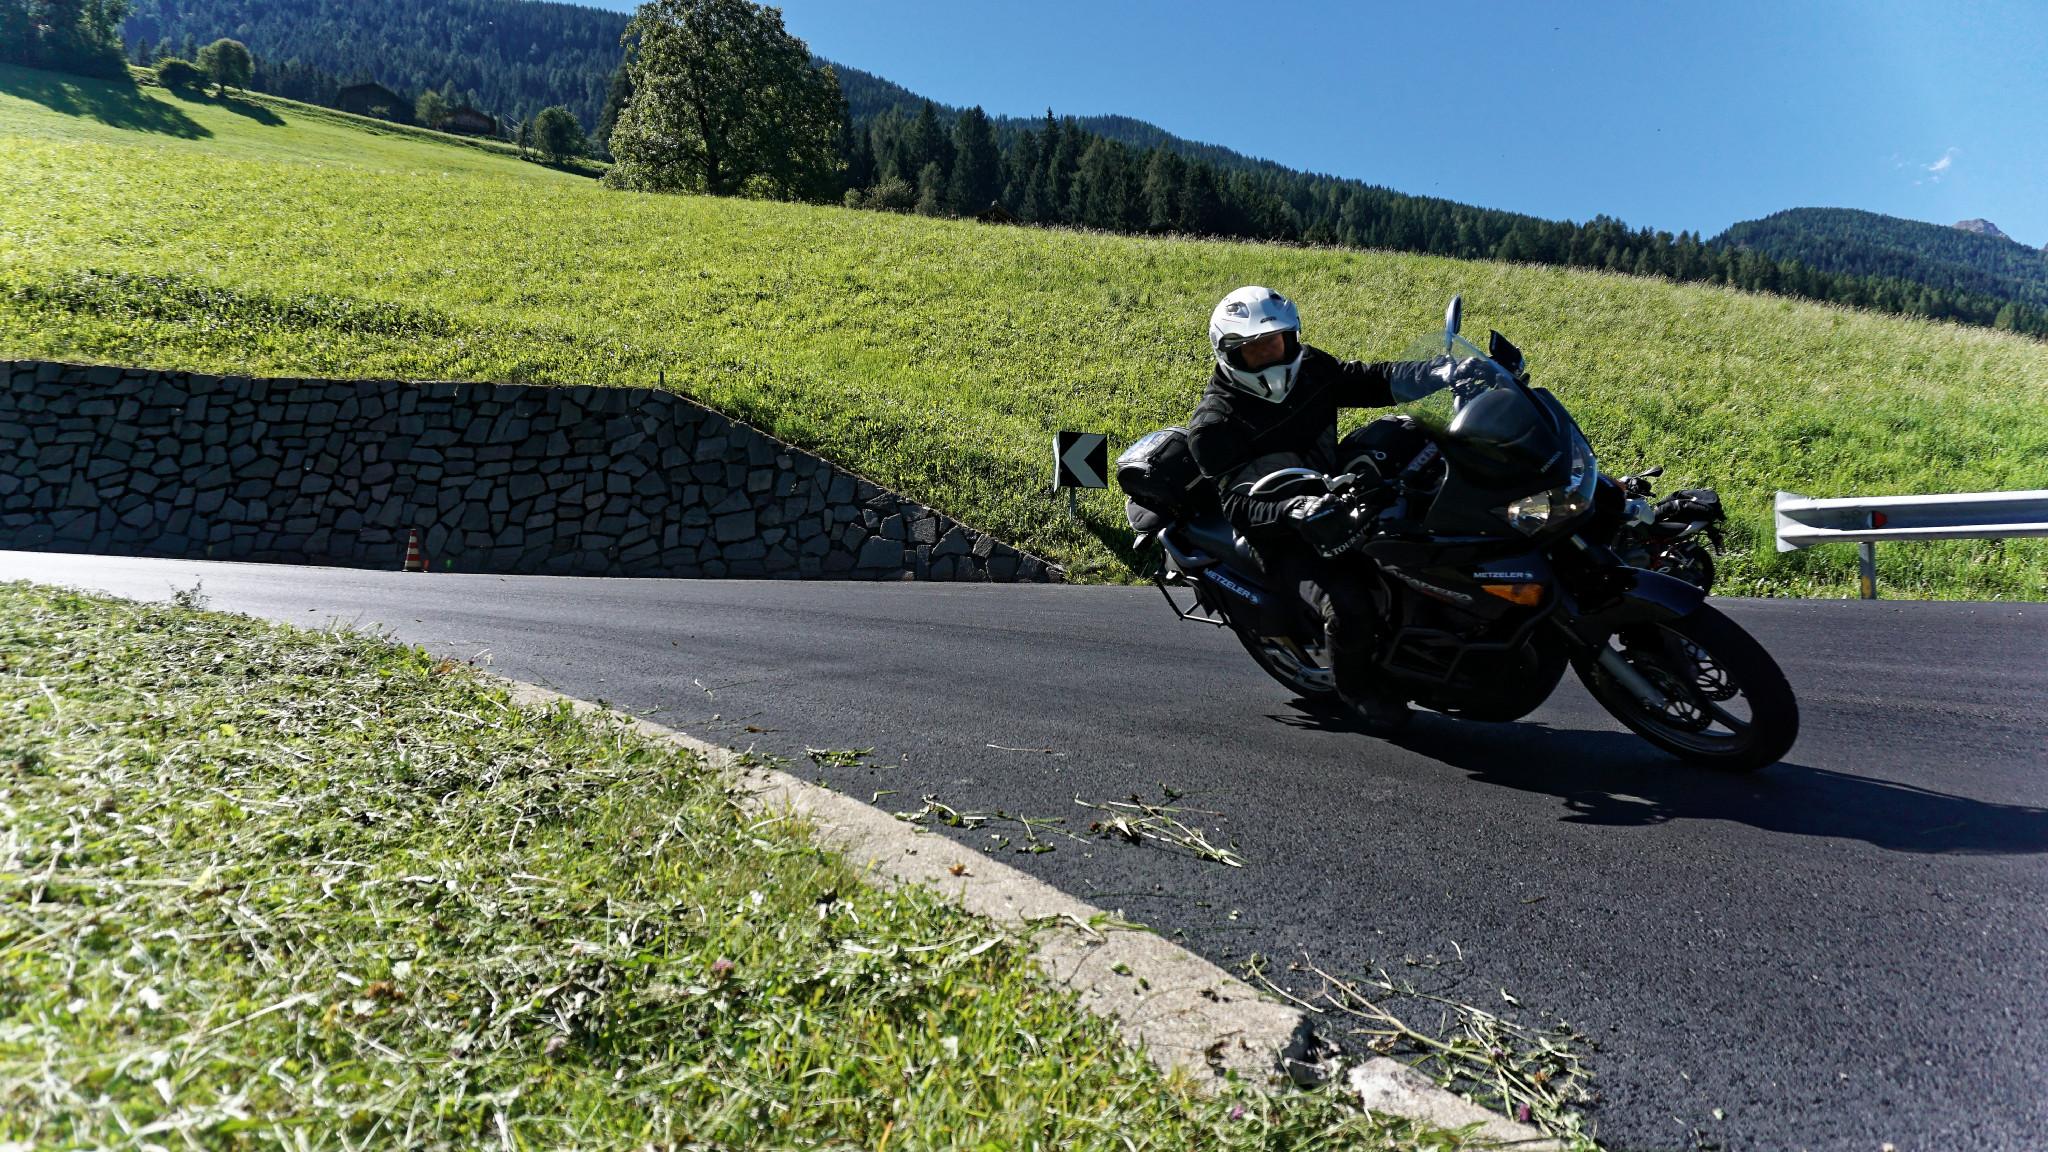 Kurt in Südtirol in Aktion